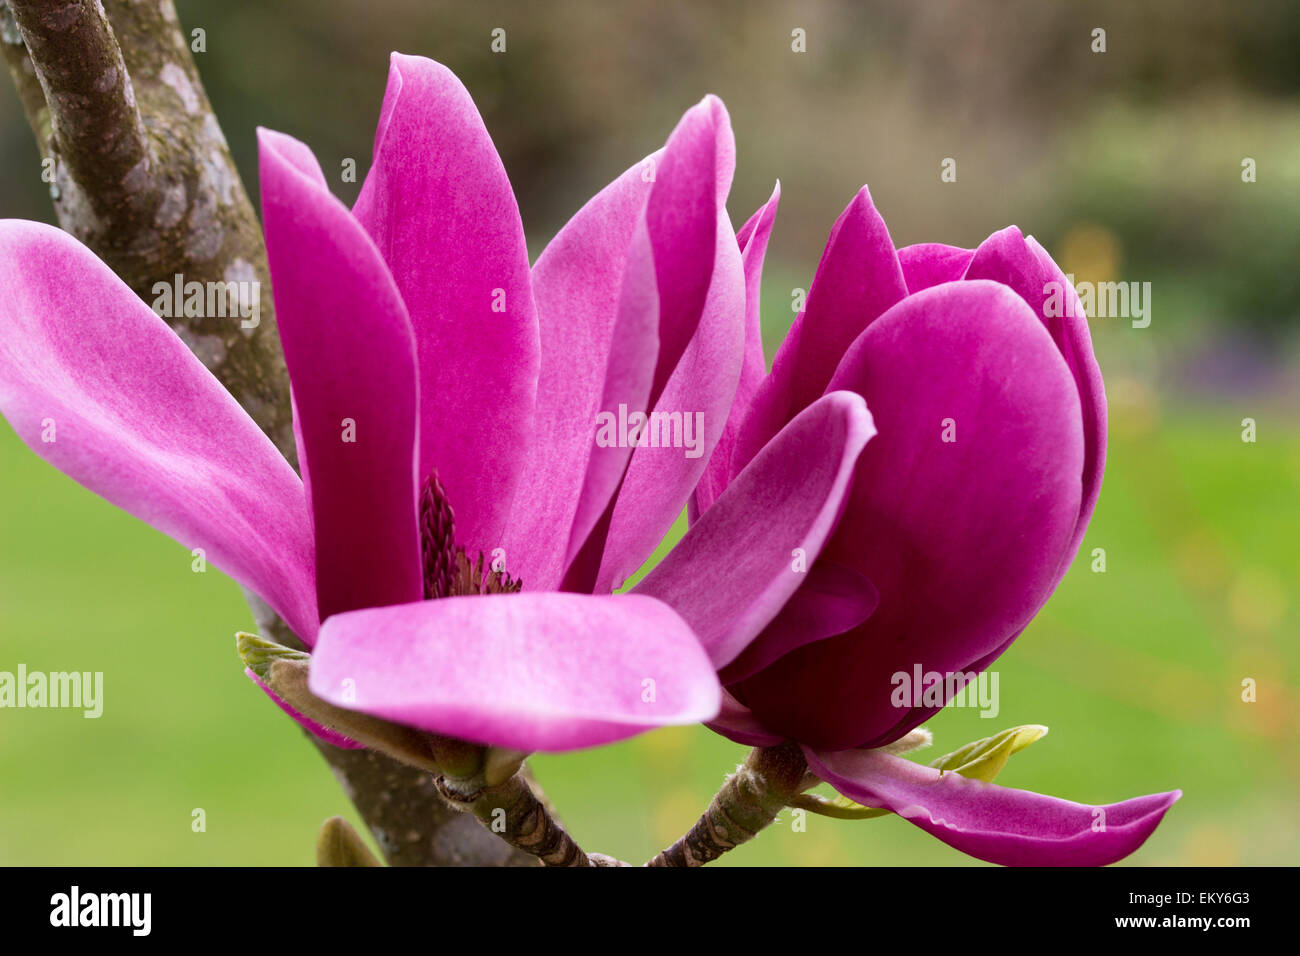 Deep pink flowers stock photos deep pink flowers stock images alamy deep pink flowers of the new zealand bred magnolia shirazz stock image mightylinksfo